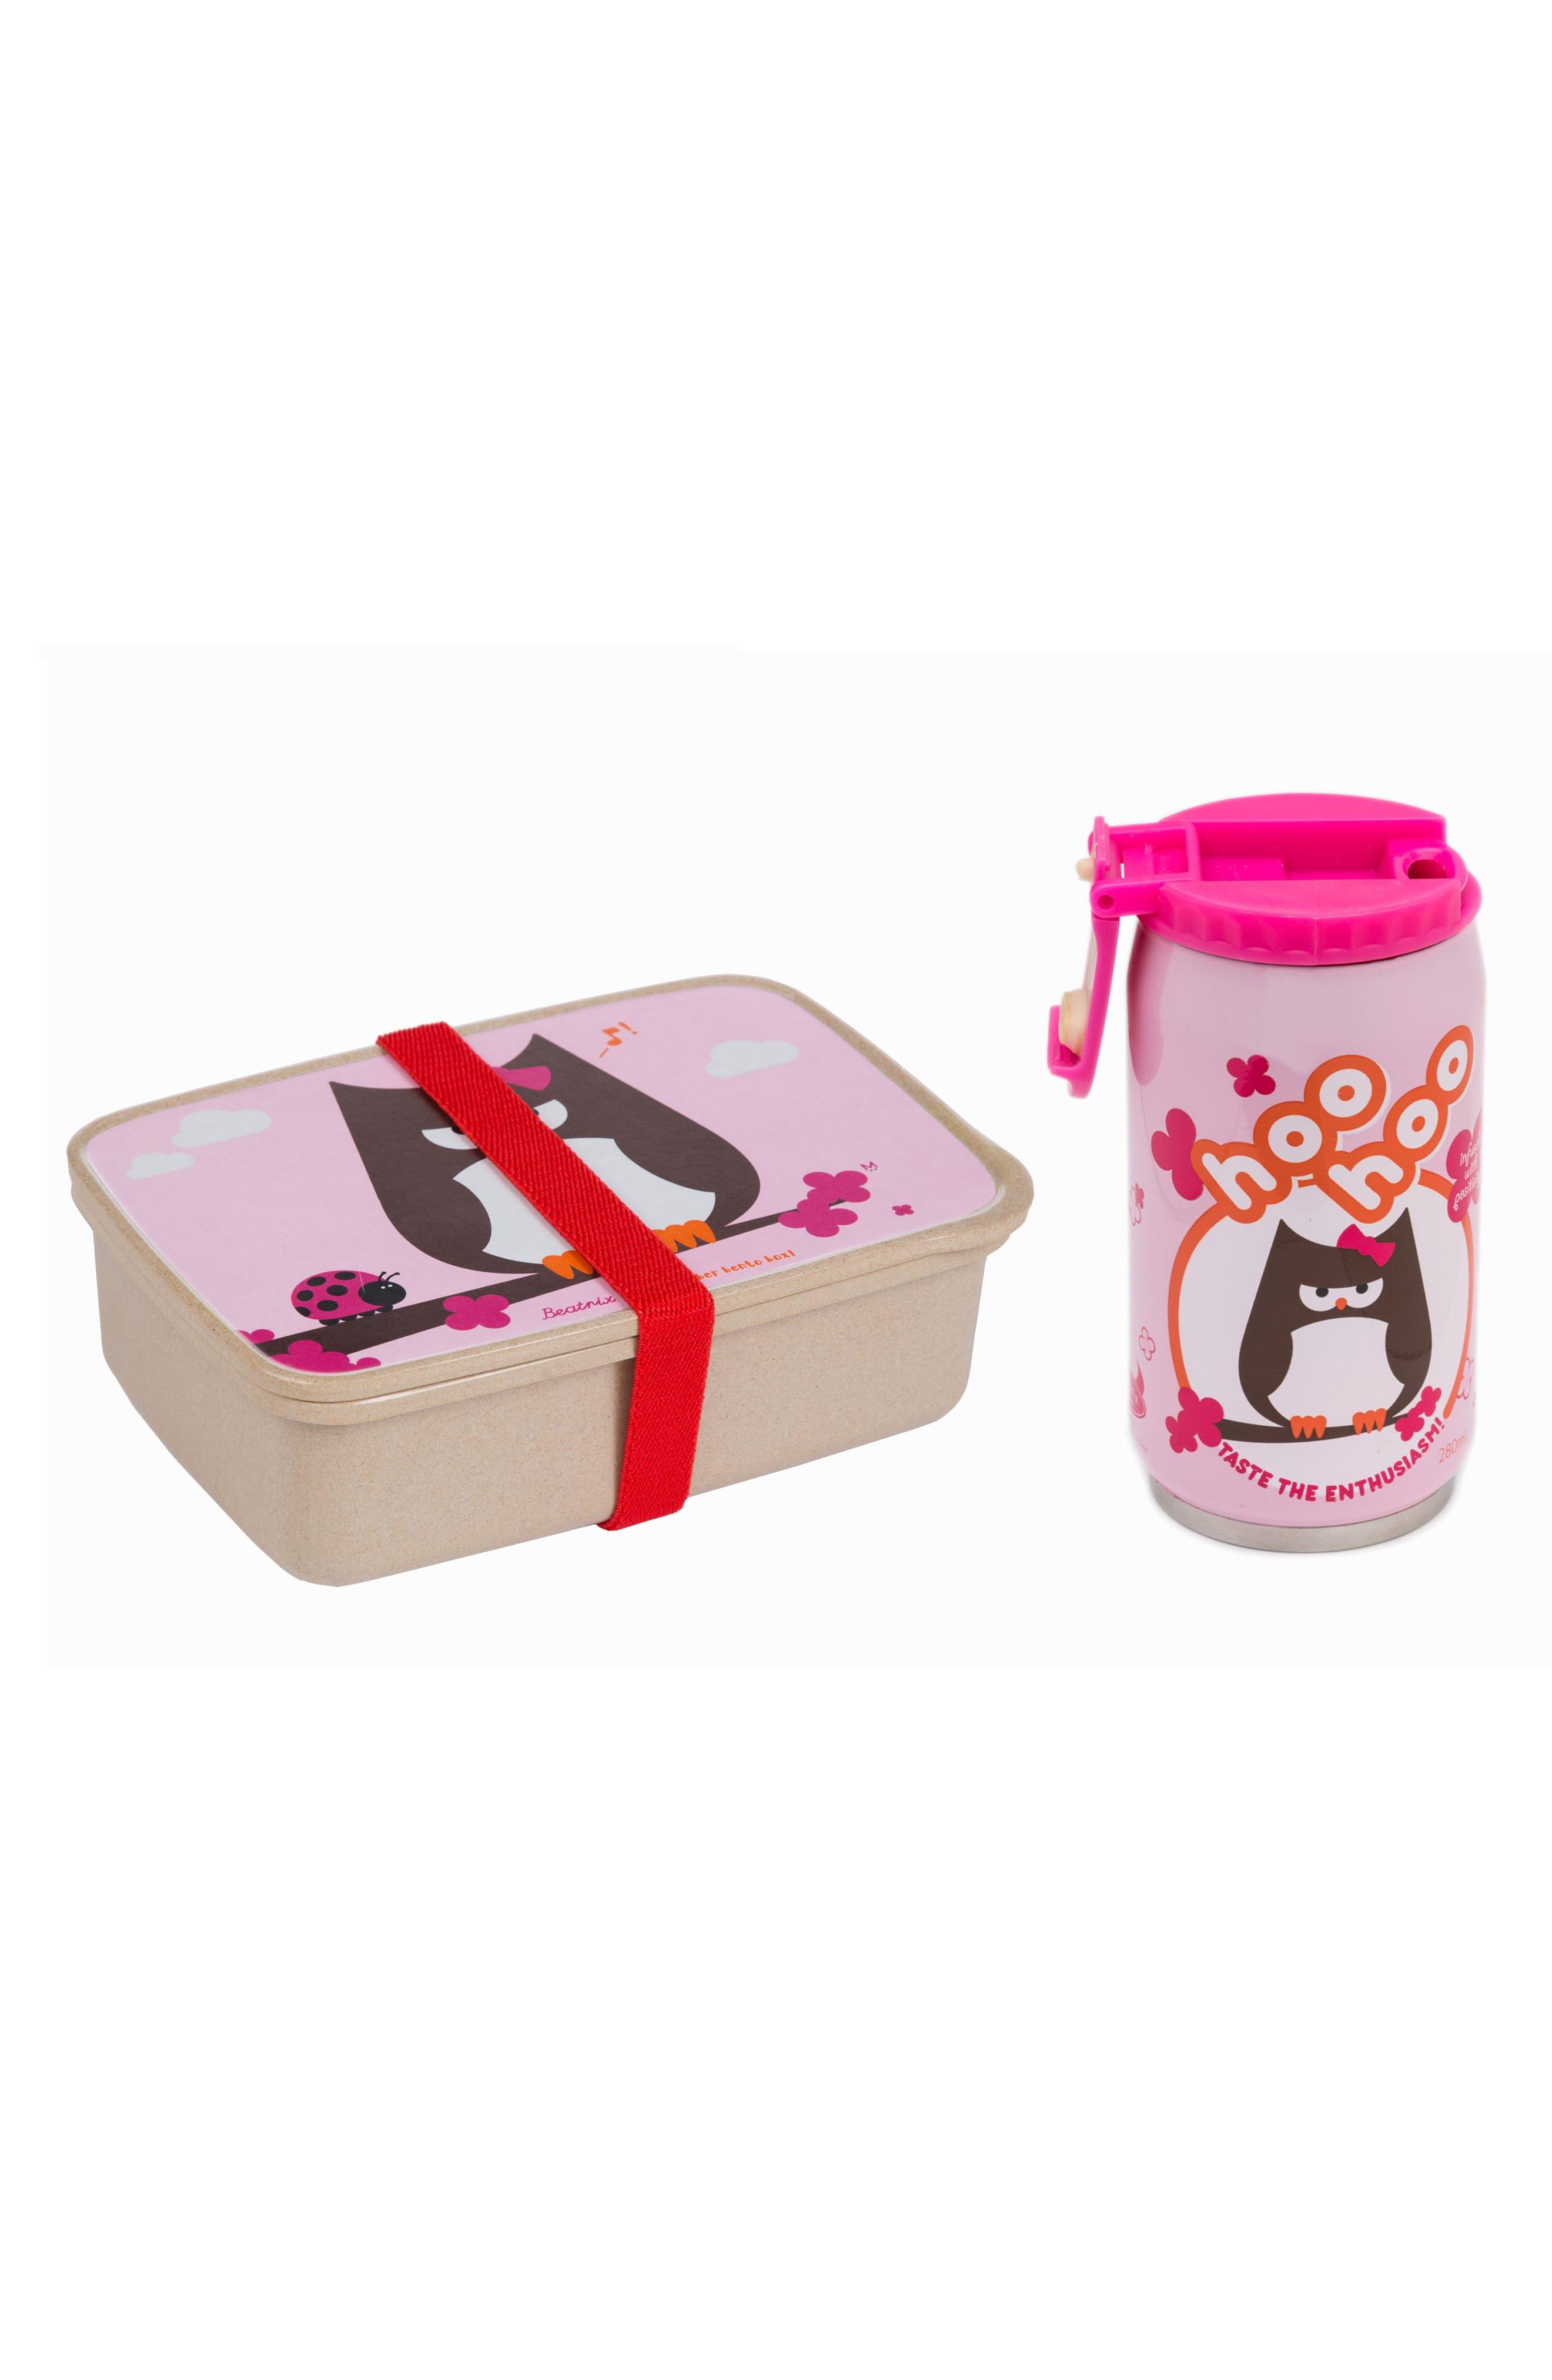 Bento Box & Bottle Set,                             Main thumbnail 1, color,                             200